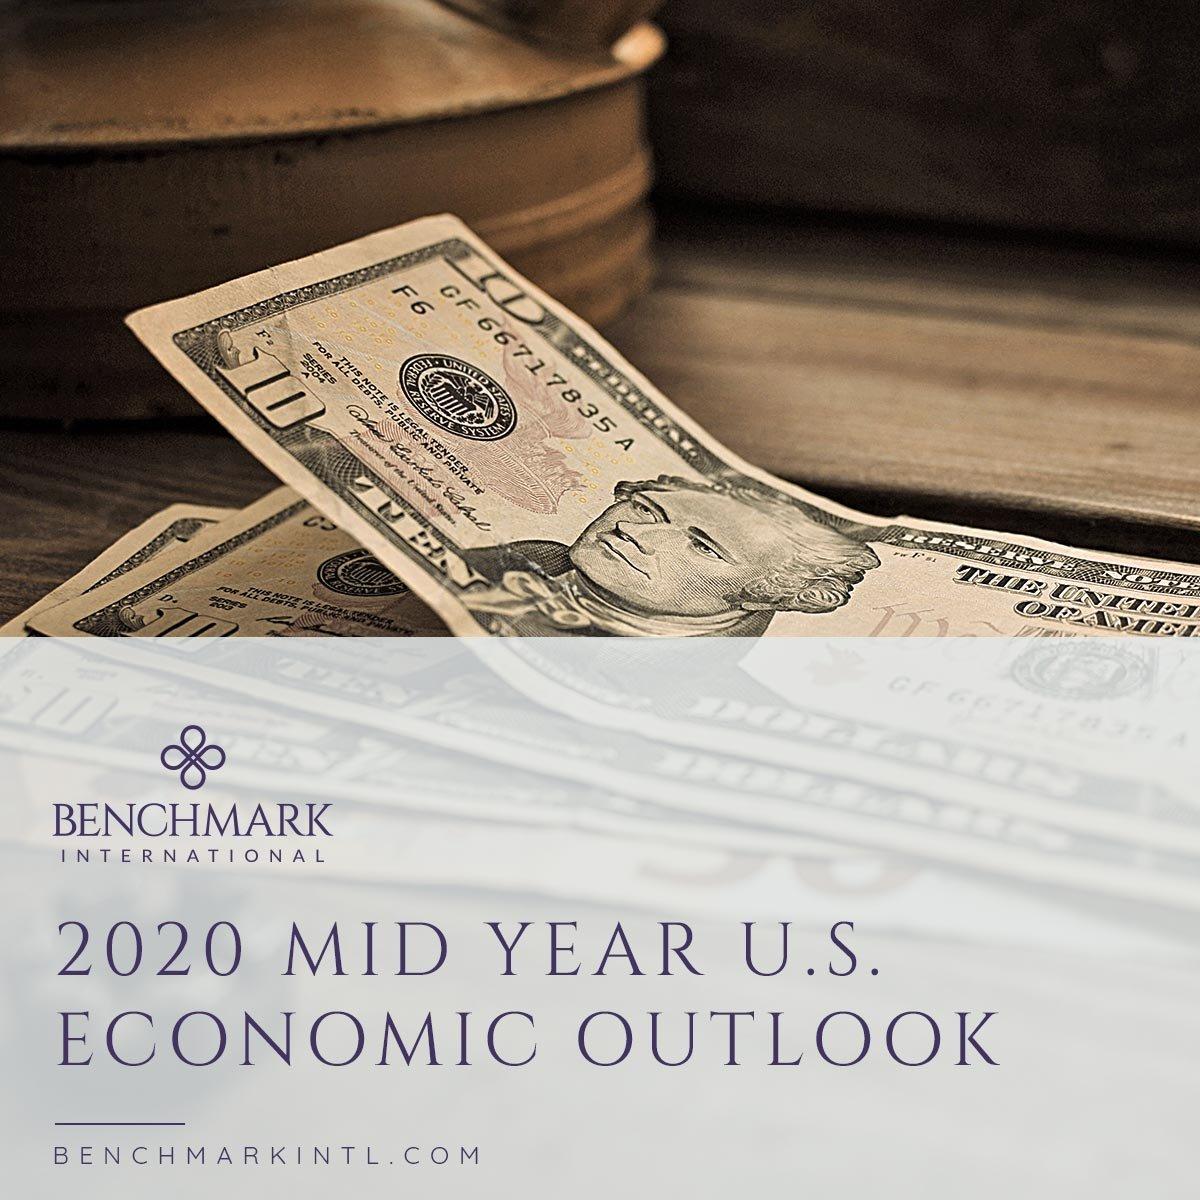 2020_Mid_Year_U.S._Economic_Outlook_Social